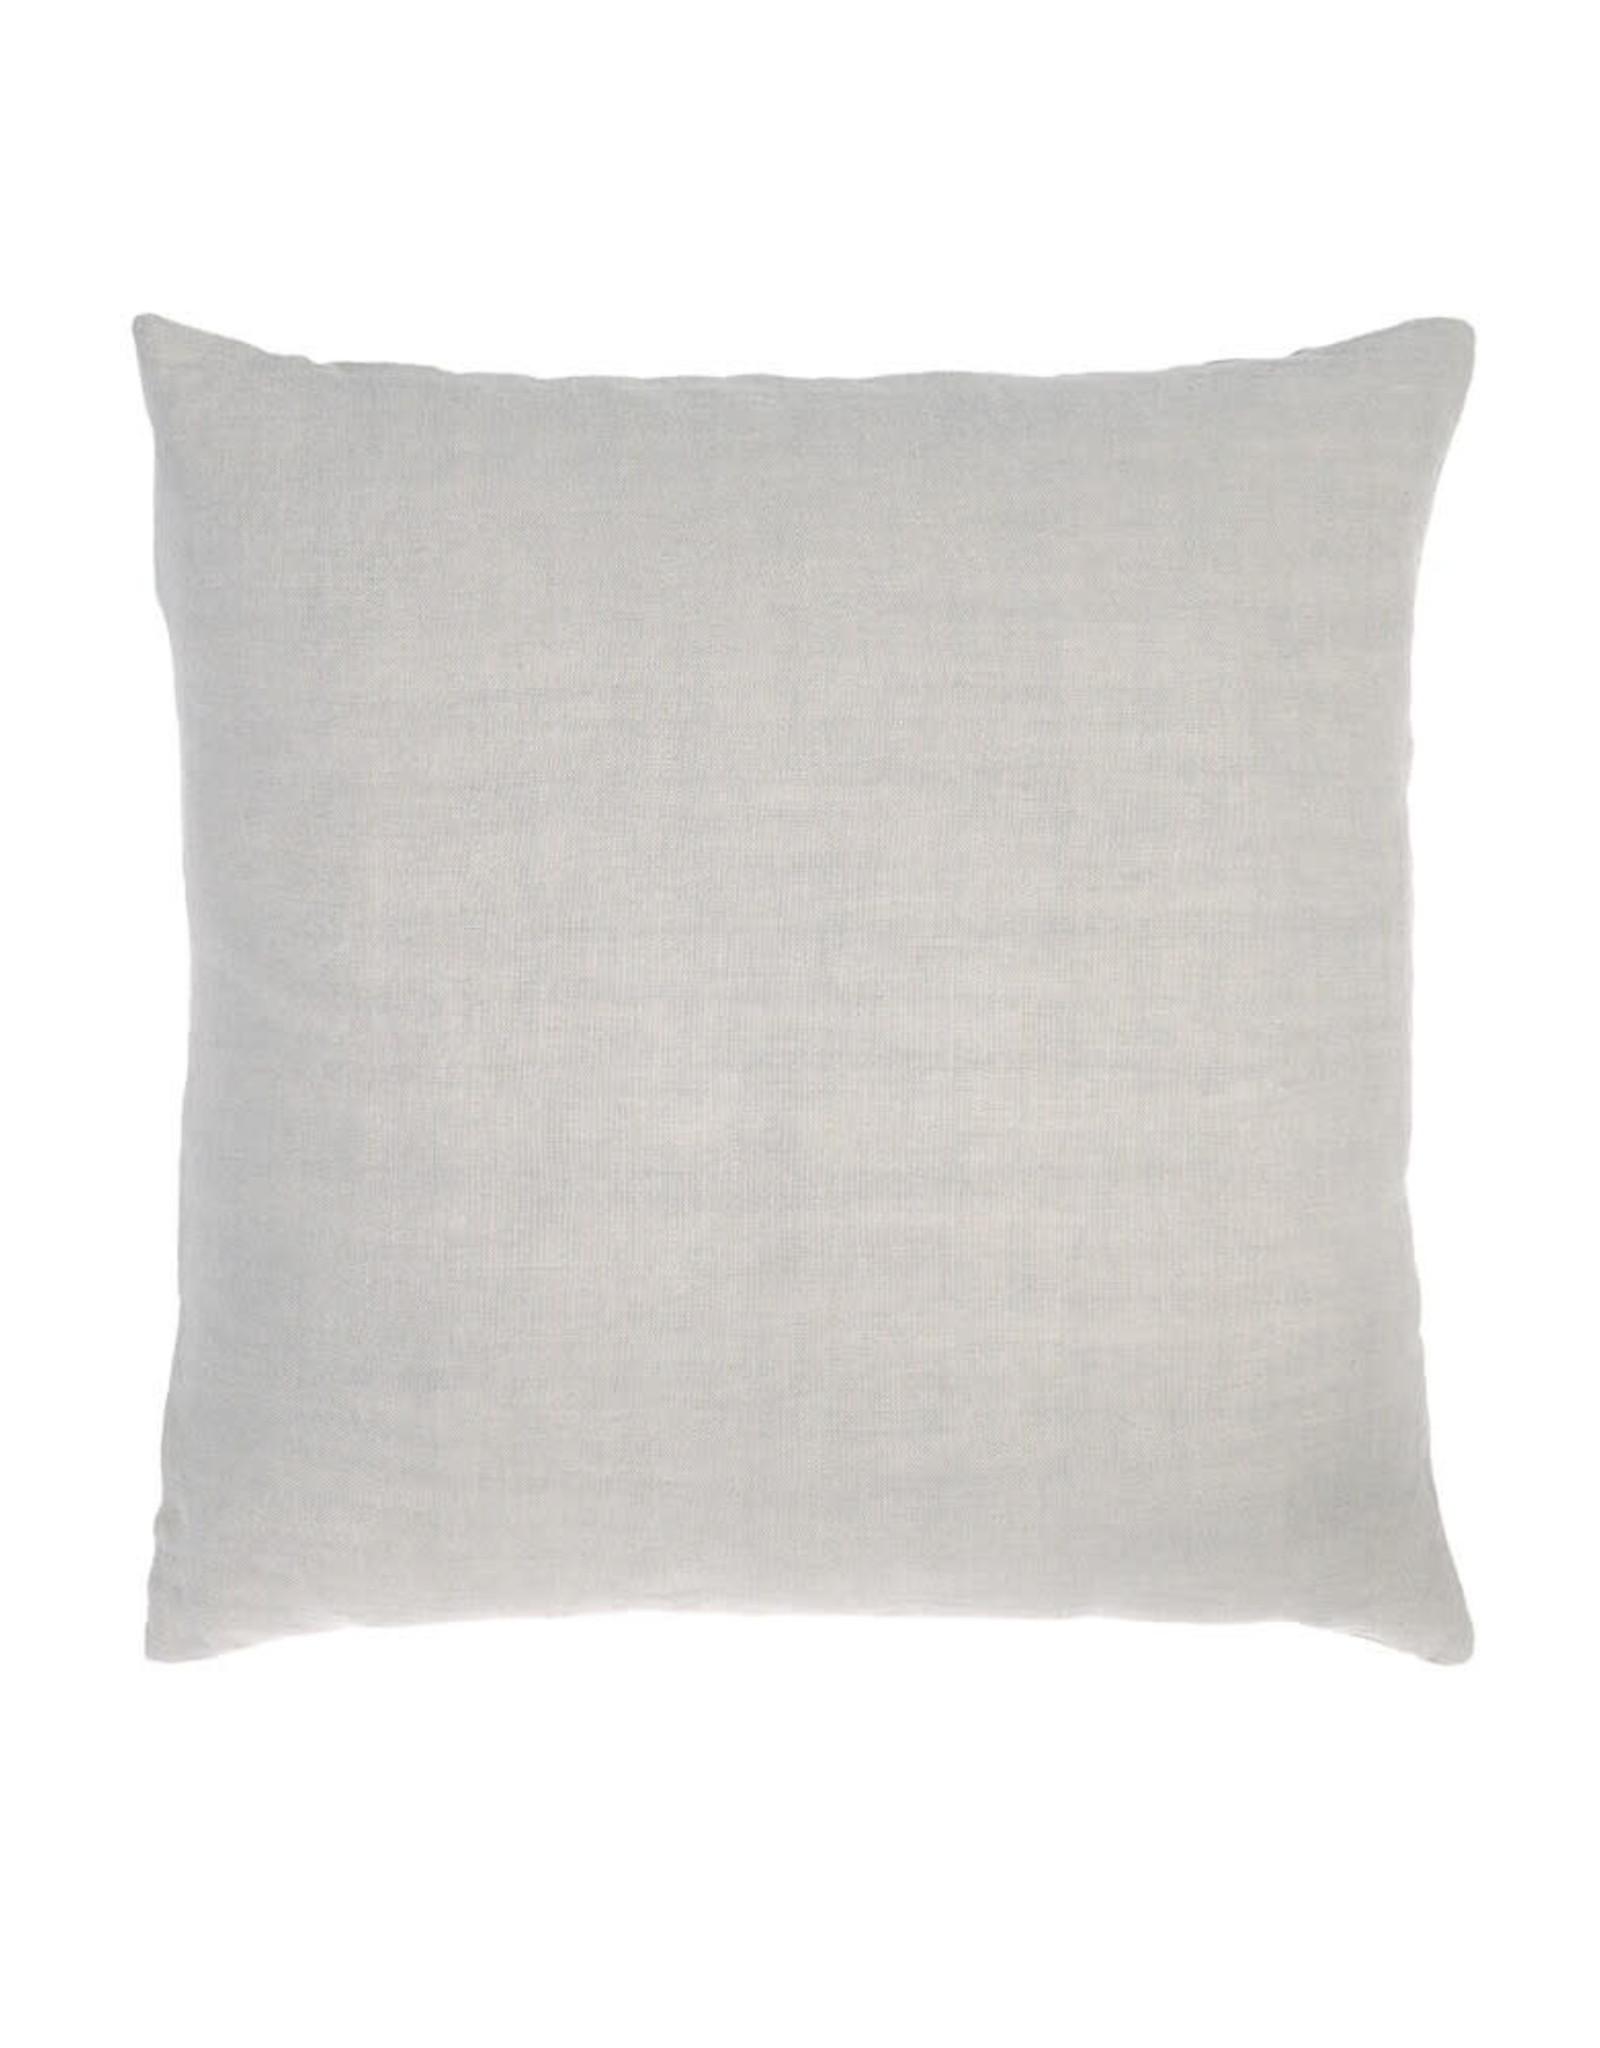 Oat Lin Sauvage Square Cushion